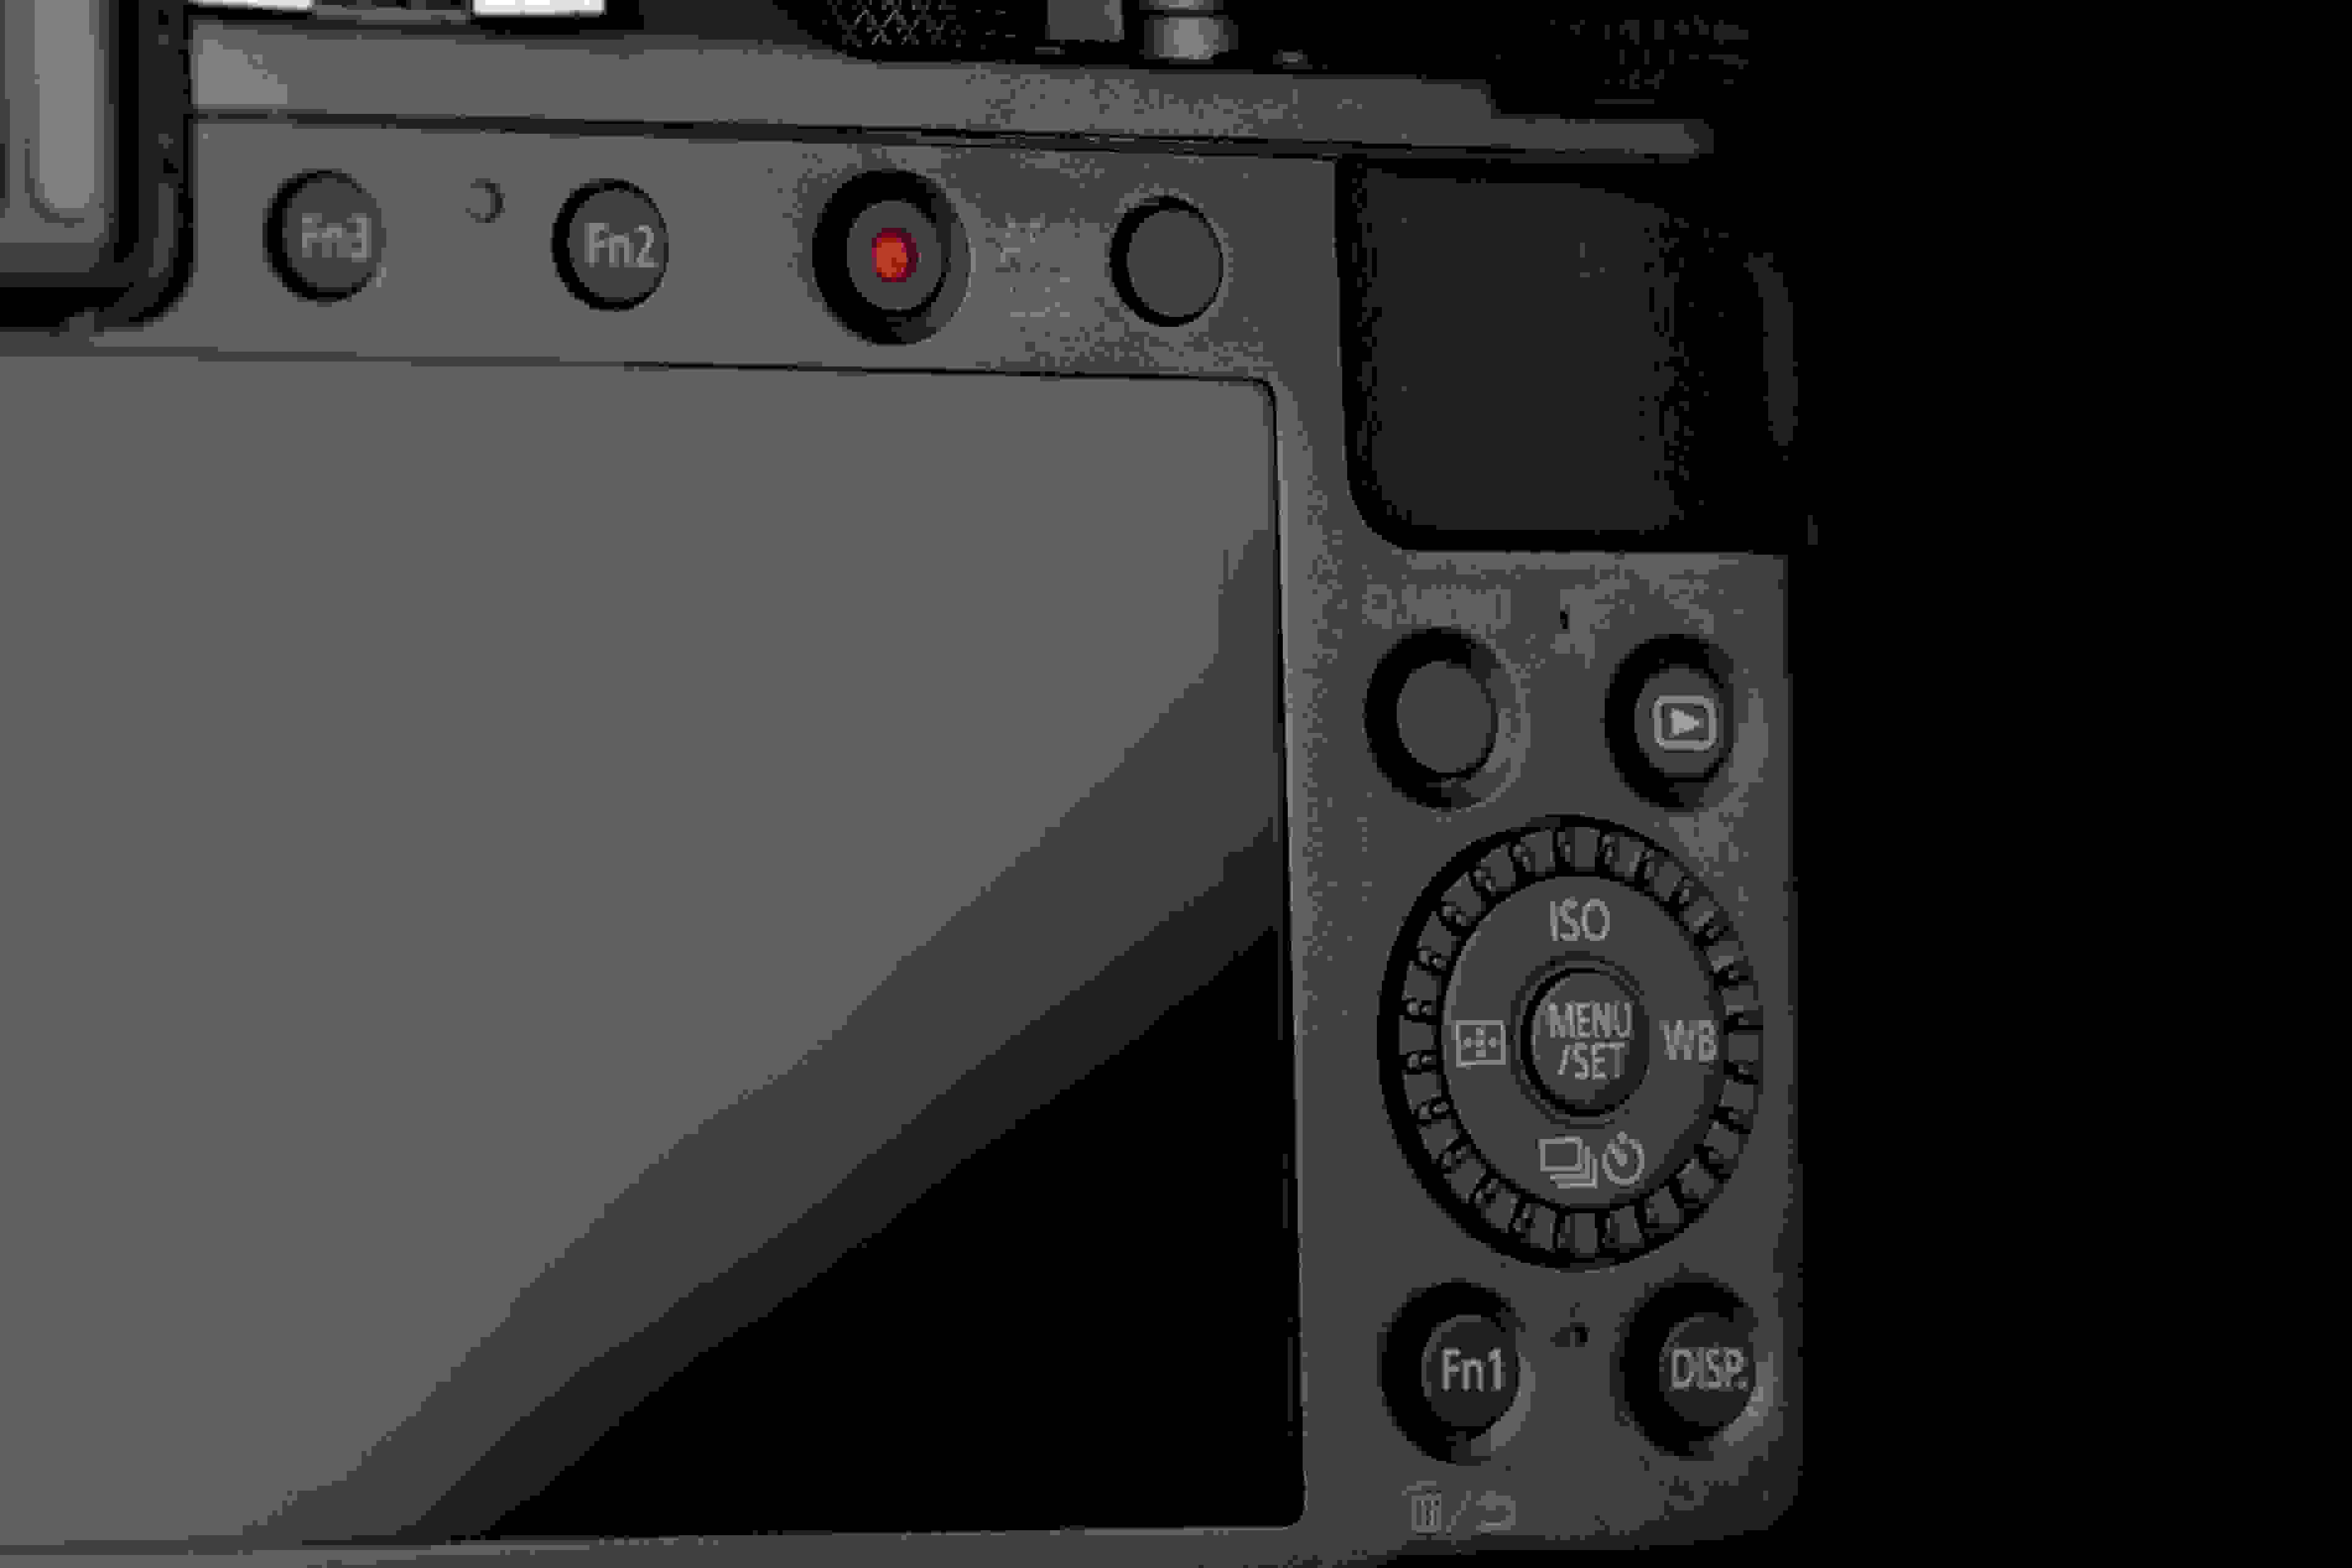 A photograph of the Panasonic Lumix LX100's rear controls.